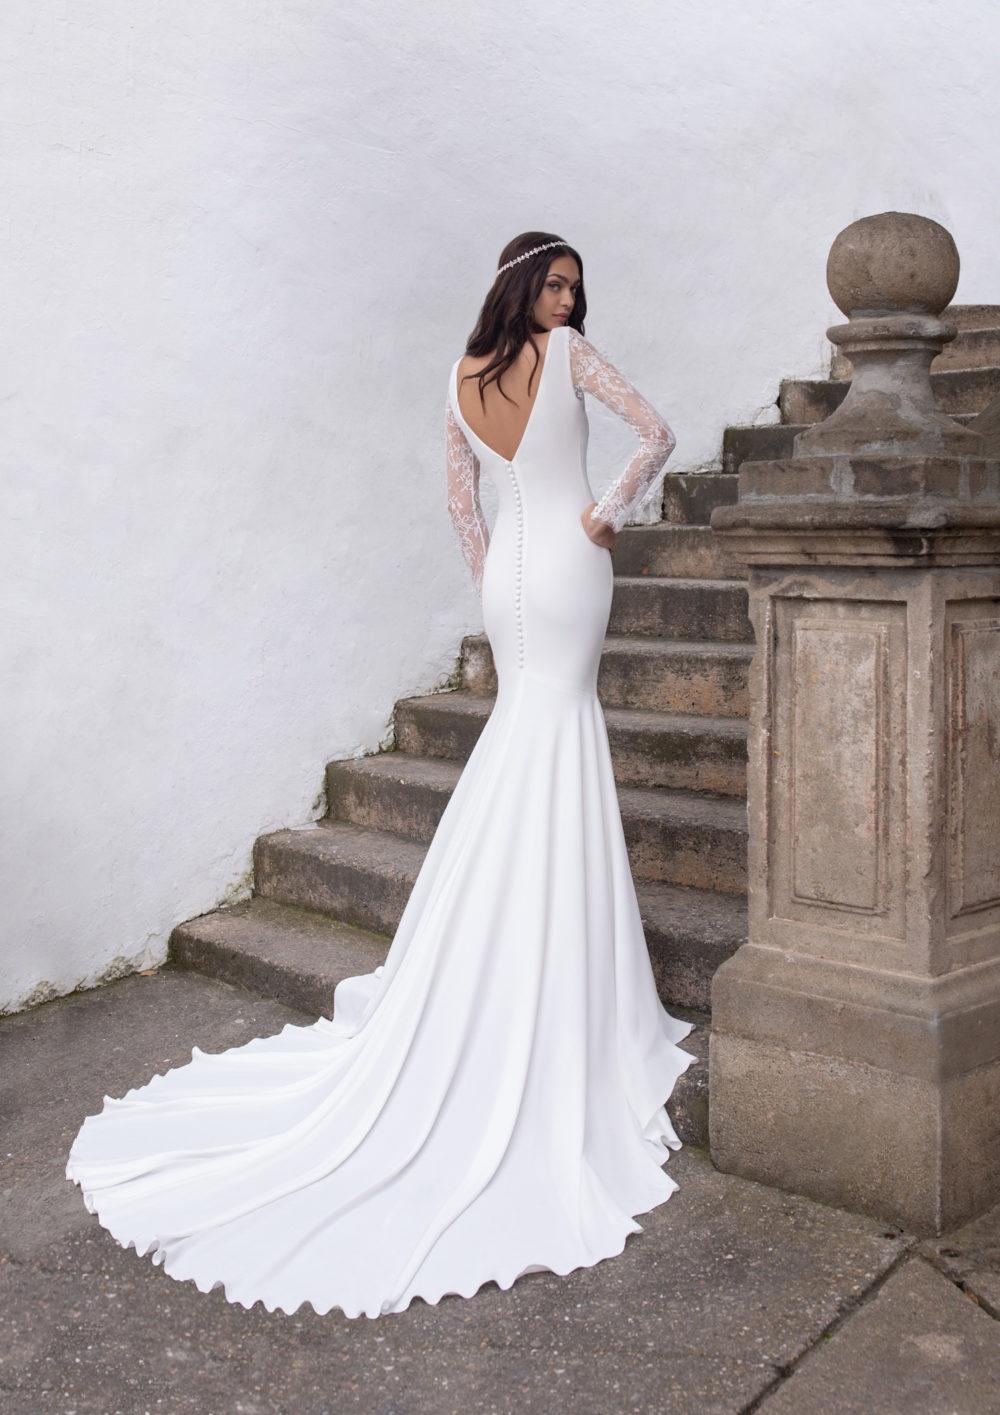 Mariages: abito da sposa Pronovias 2020 a Vicenza, Verona, Padova, Veneto KEMI